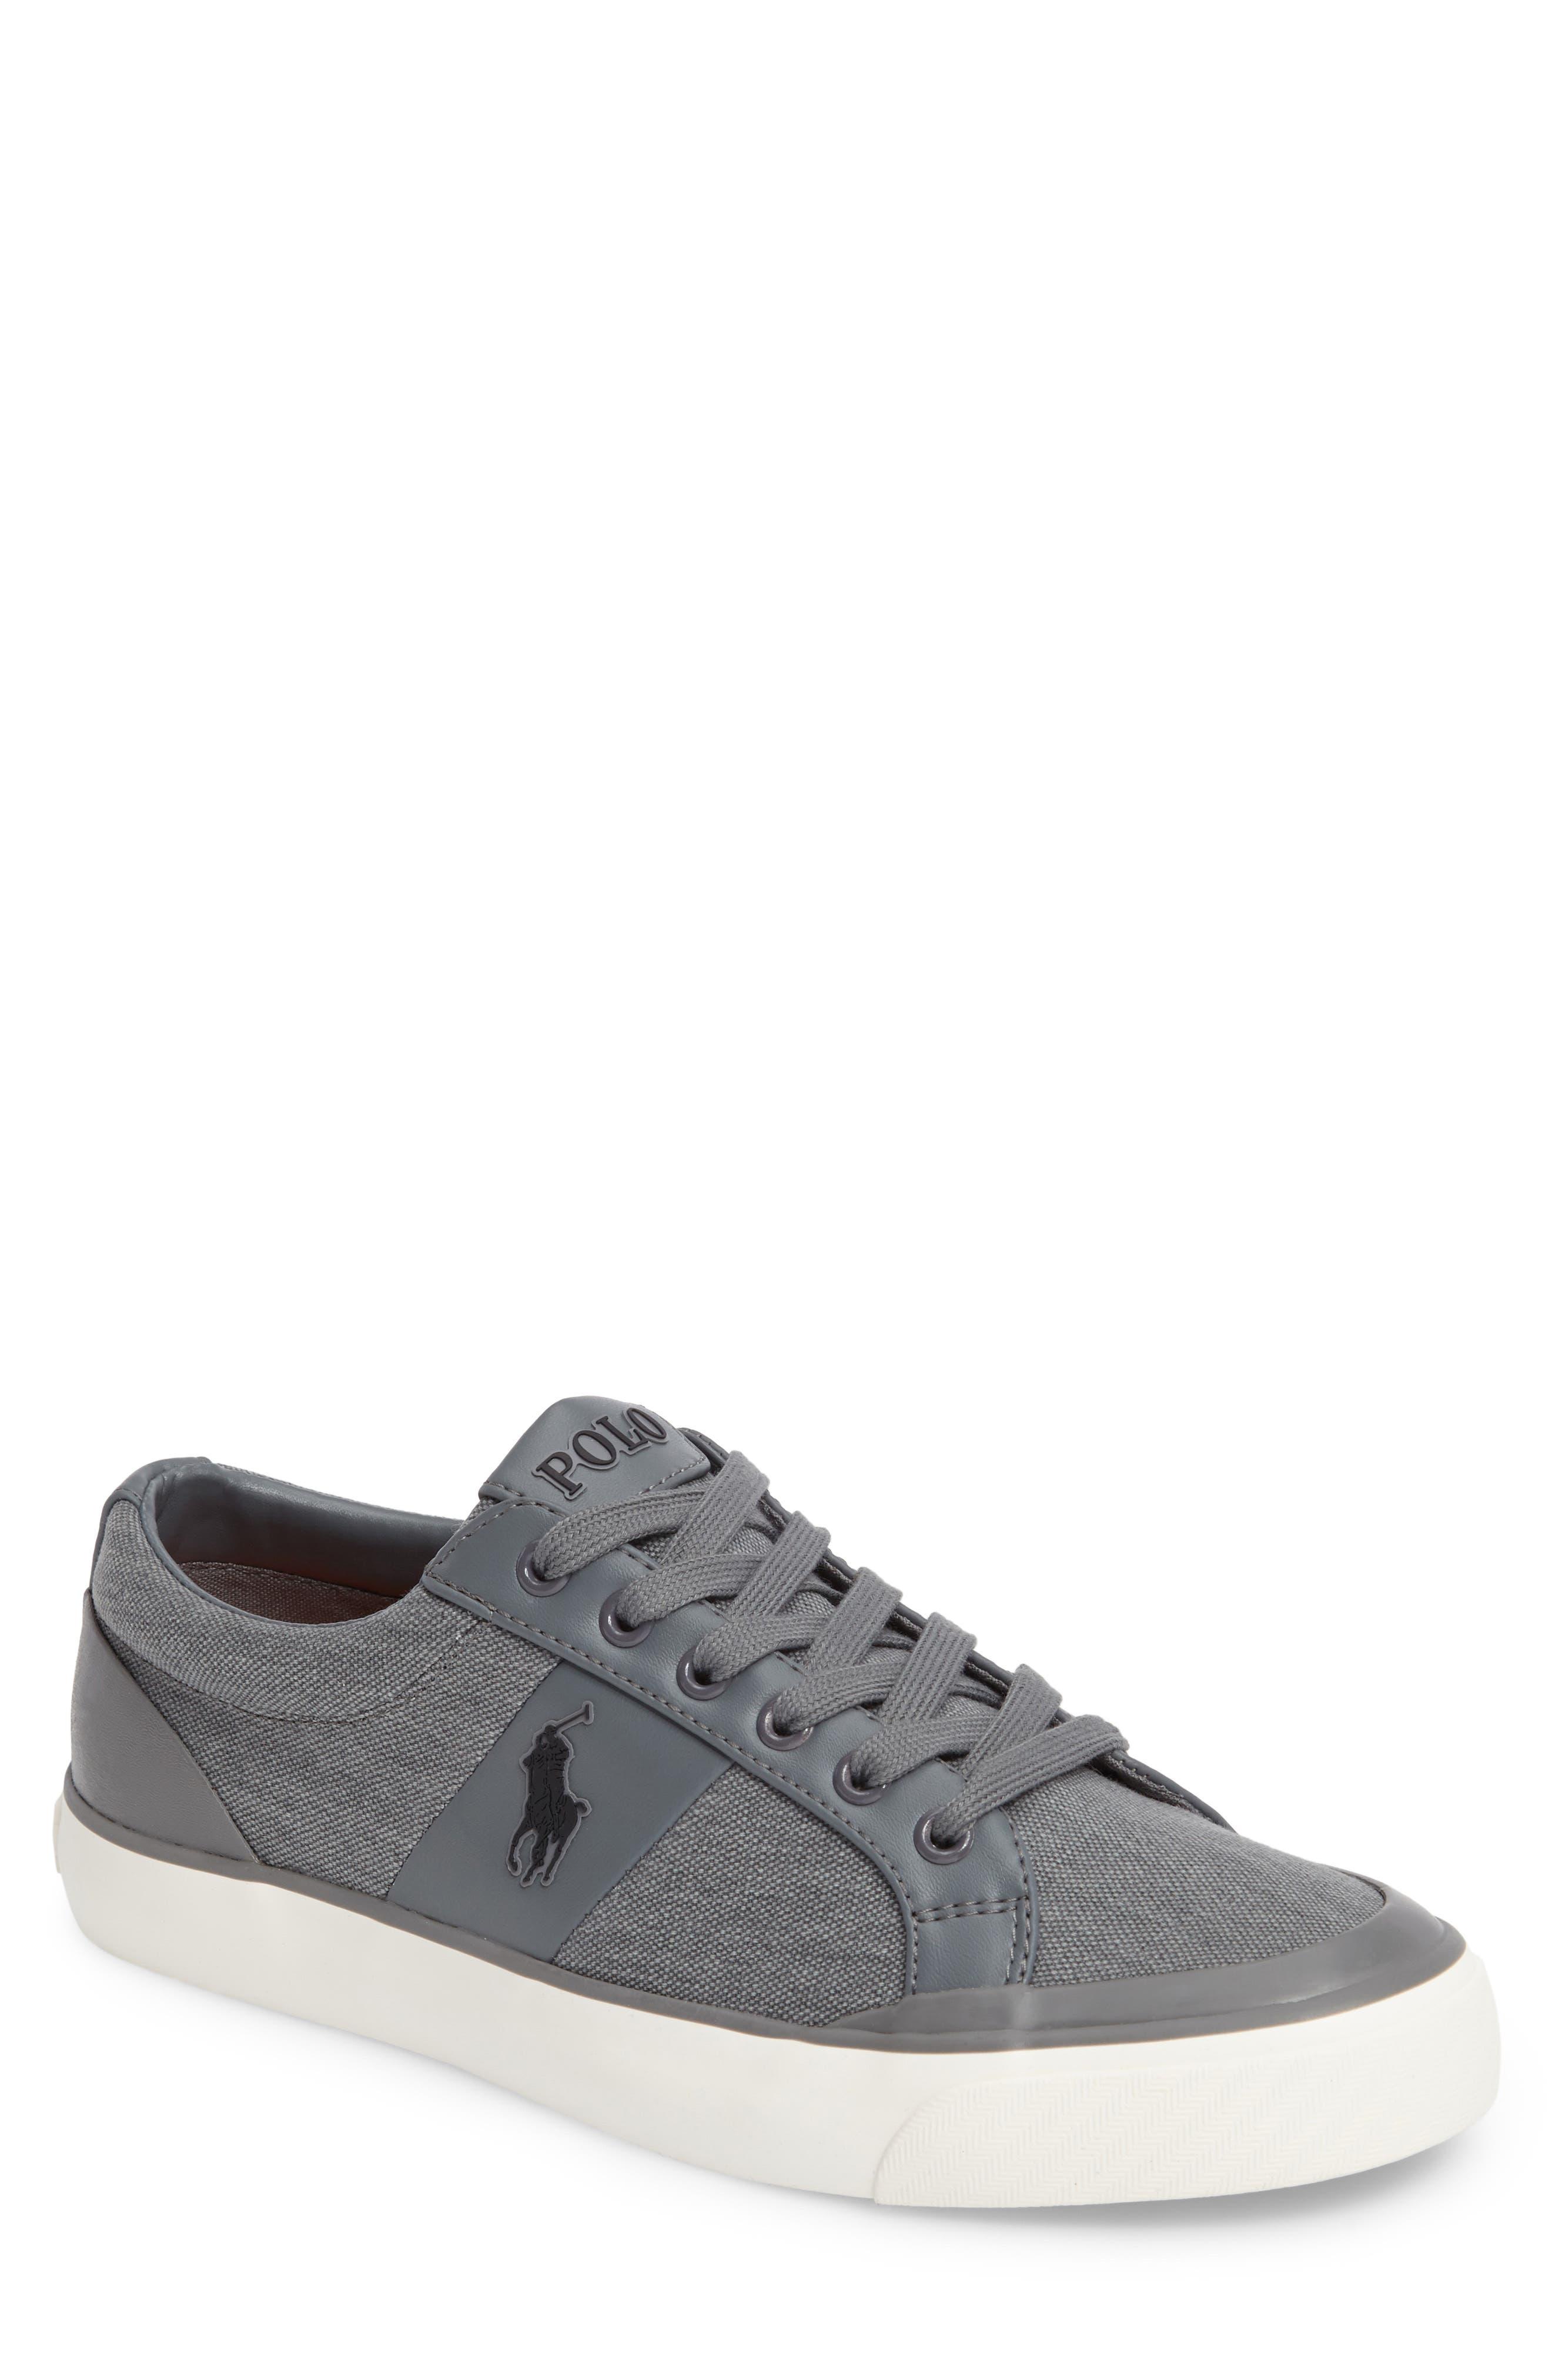 Polo Ralph Lauren Ian Sneaker,                         Main,                         color, Slate